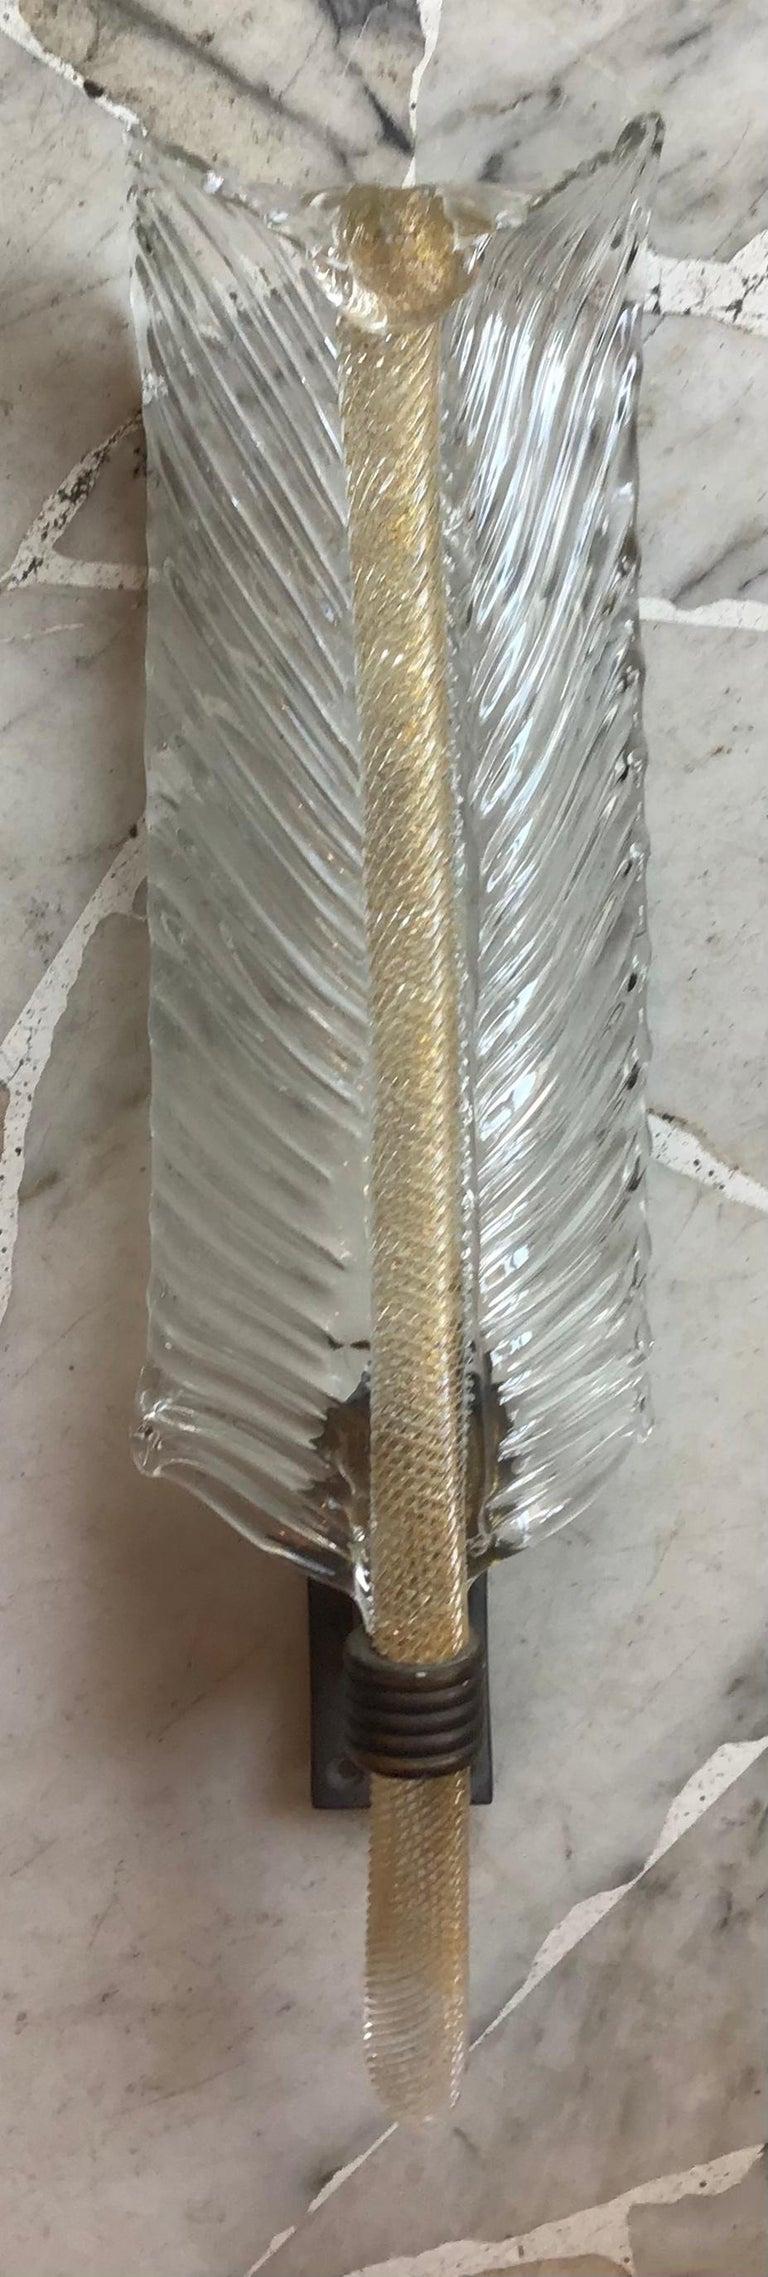 Venini Sconce Murano Glass Gold Brass, 1930, Italy For Sale 3